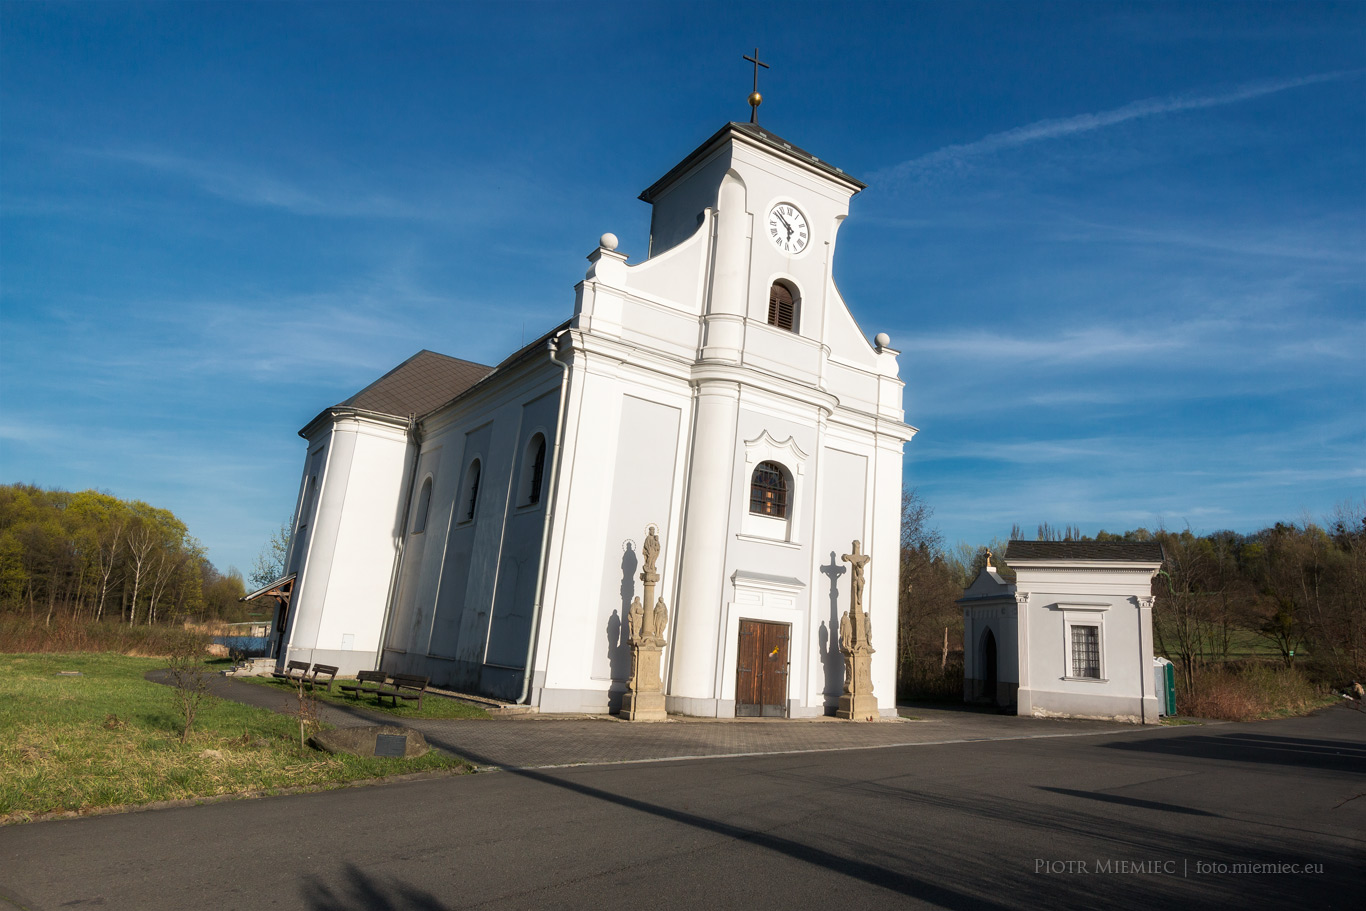 Karwina Kościół św. Piotra z Alkantary IMG_7474